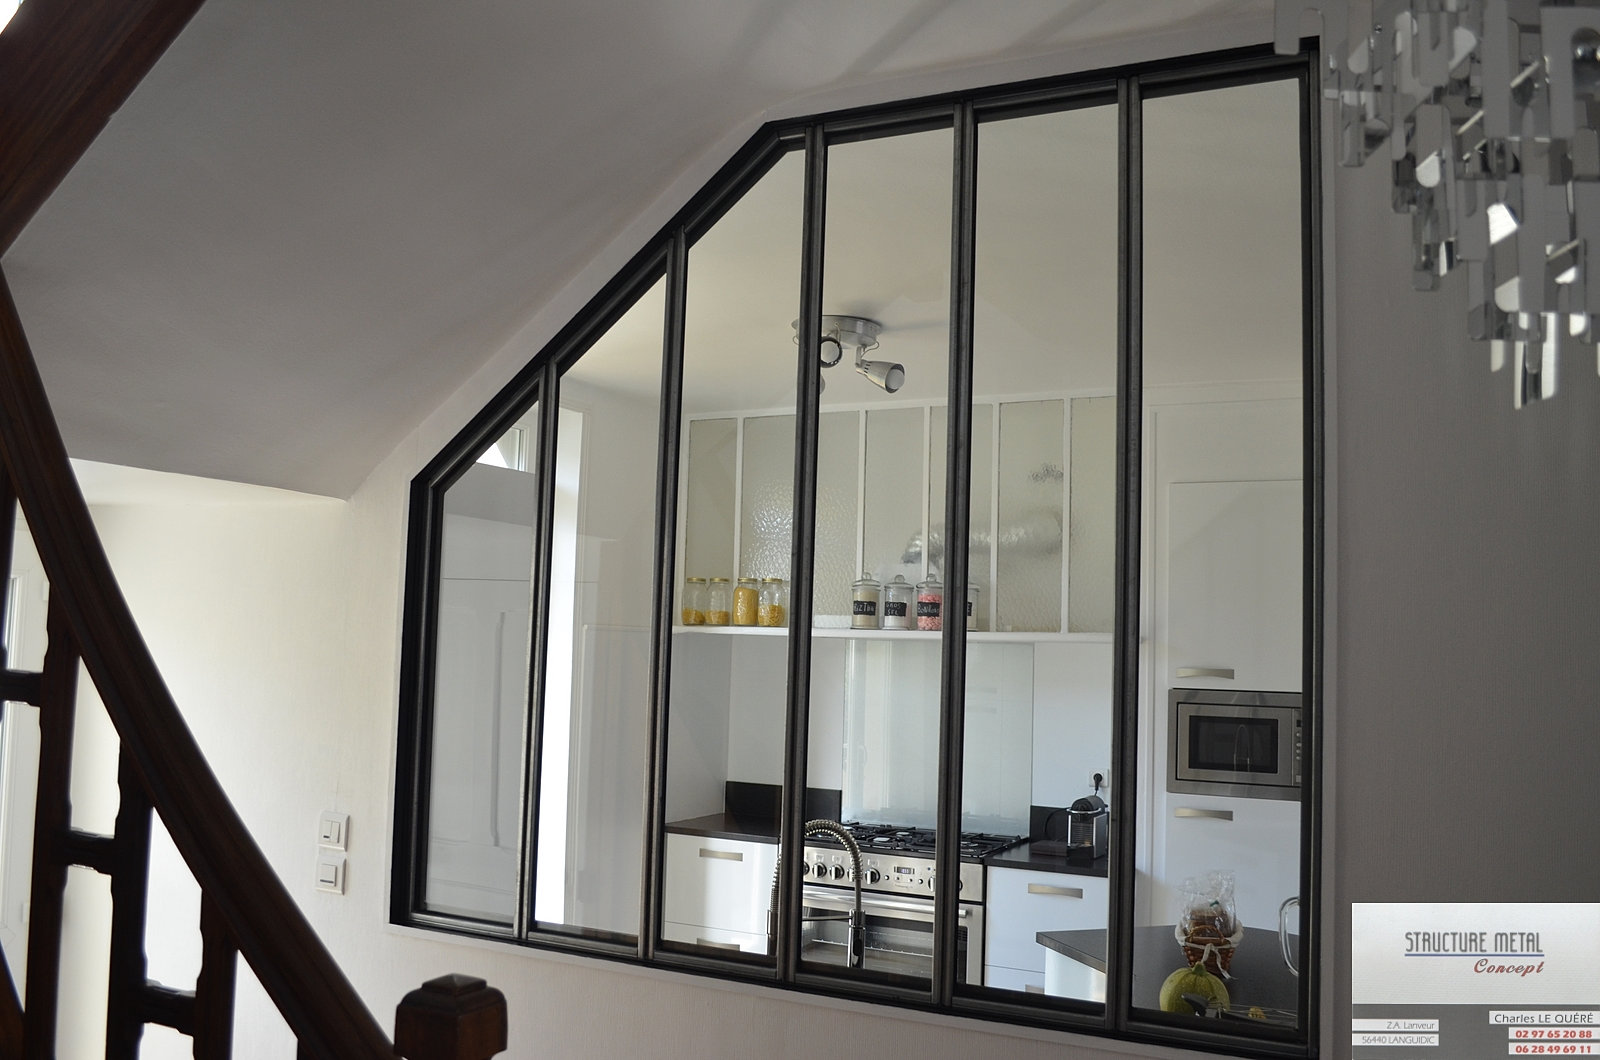 cloison vitr e structuremetalconcept. Black Bedroom Furniture Sets. Home Design Ideas